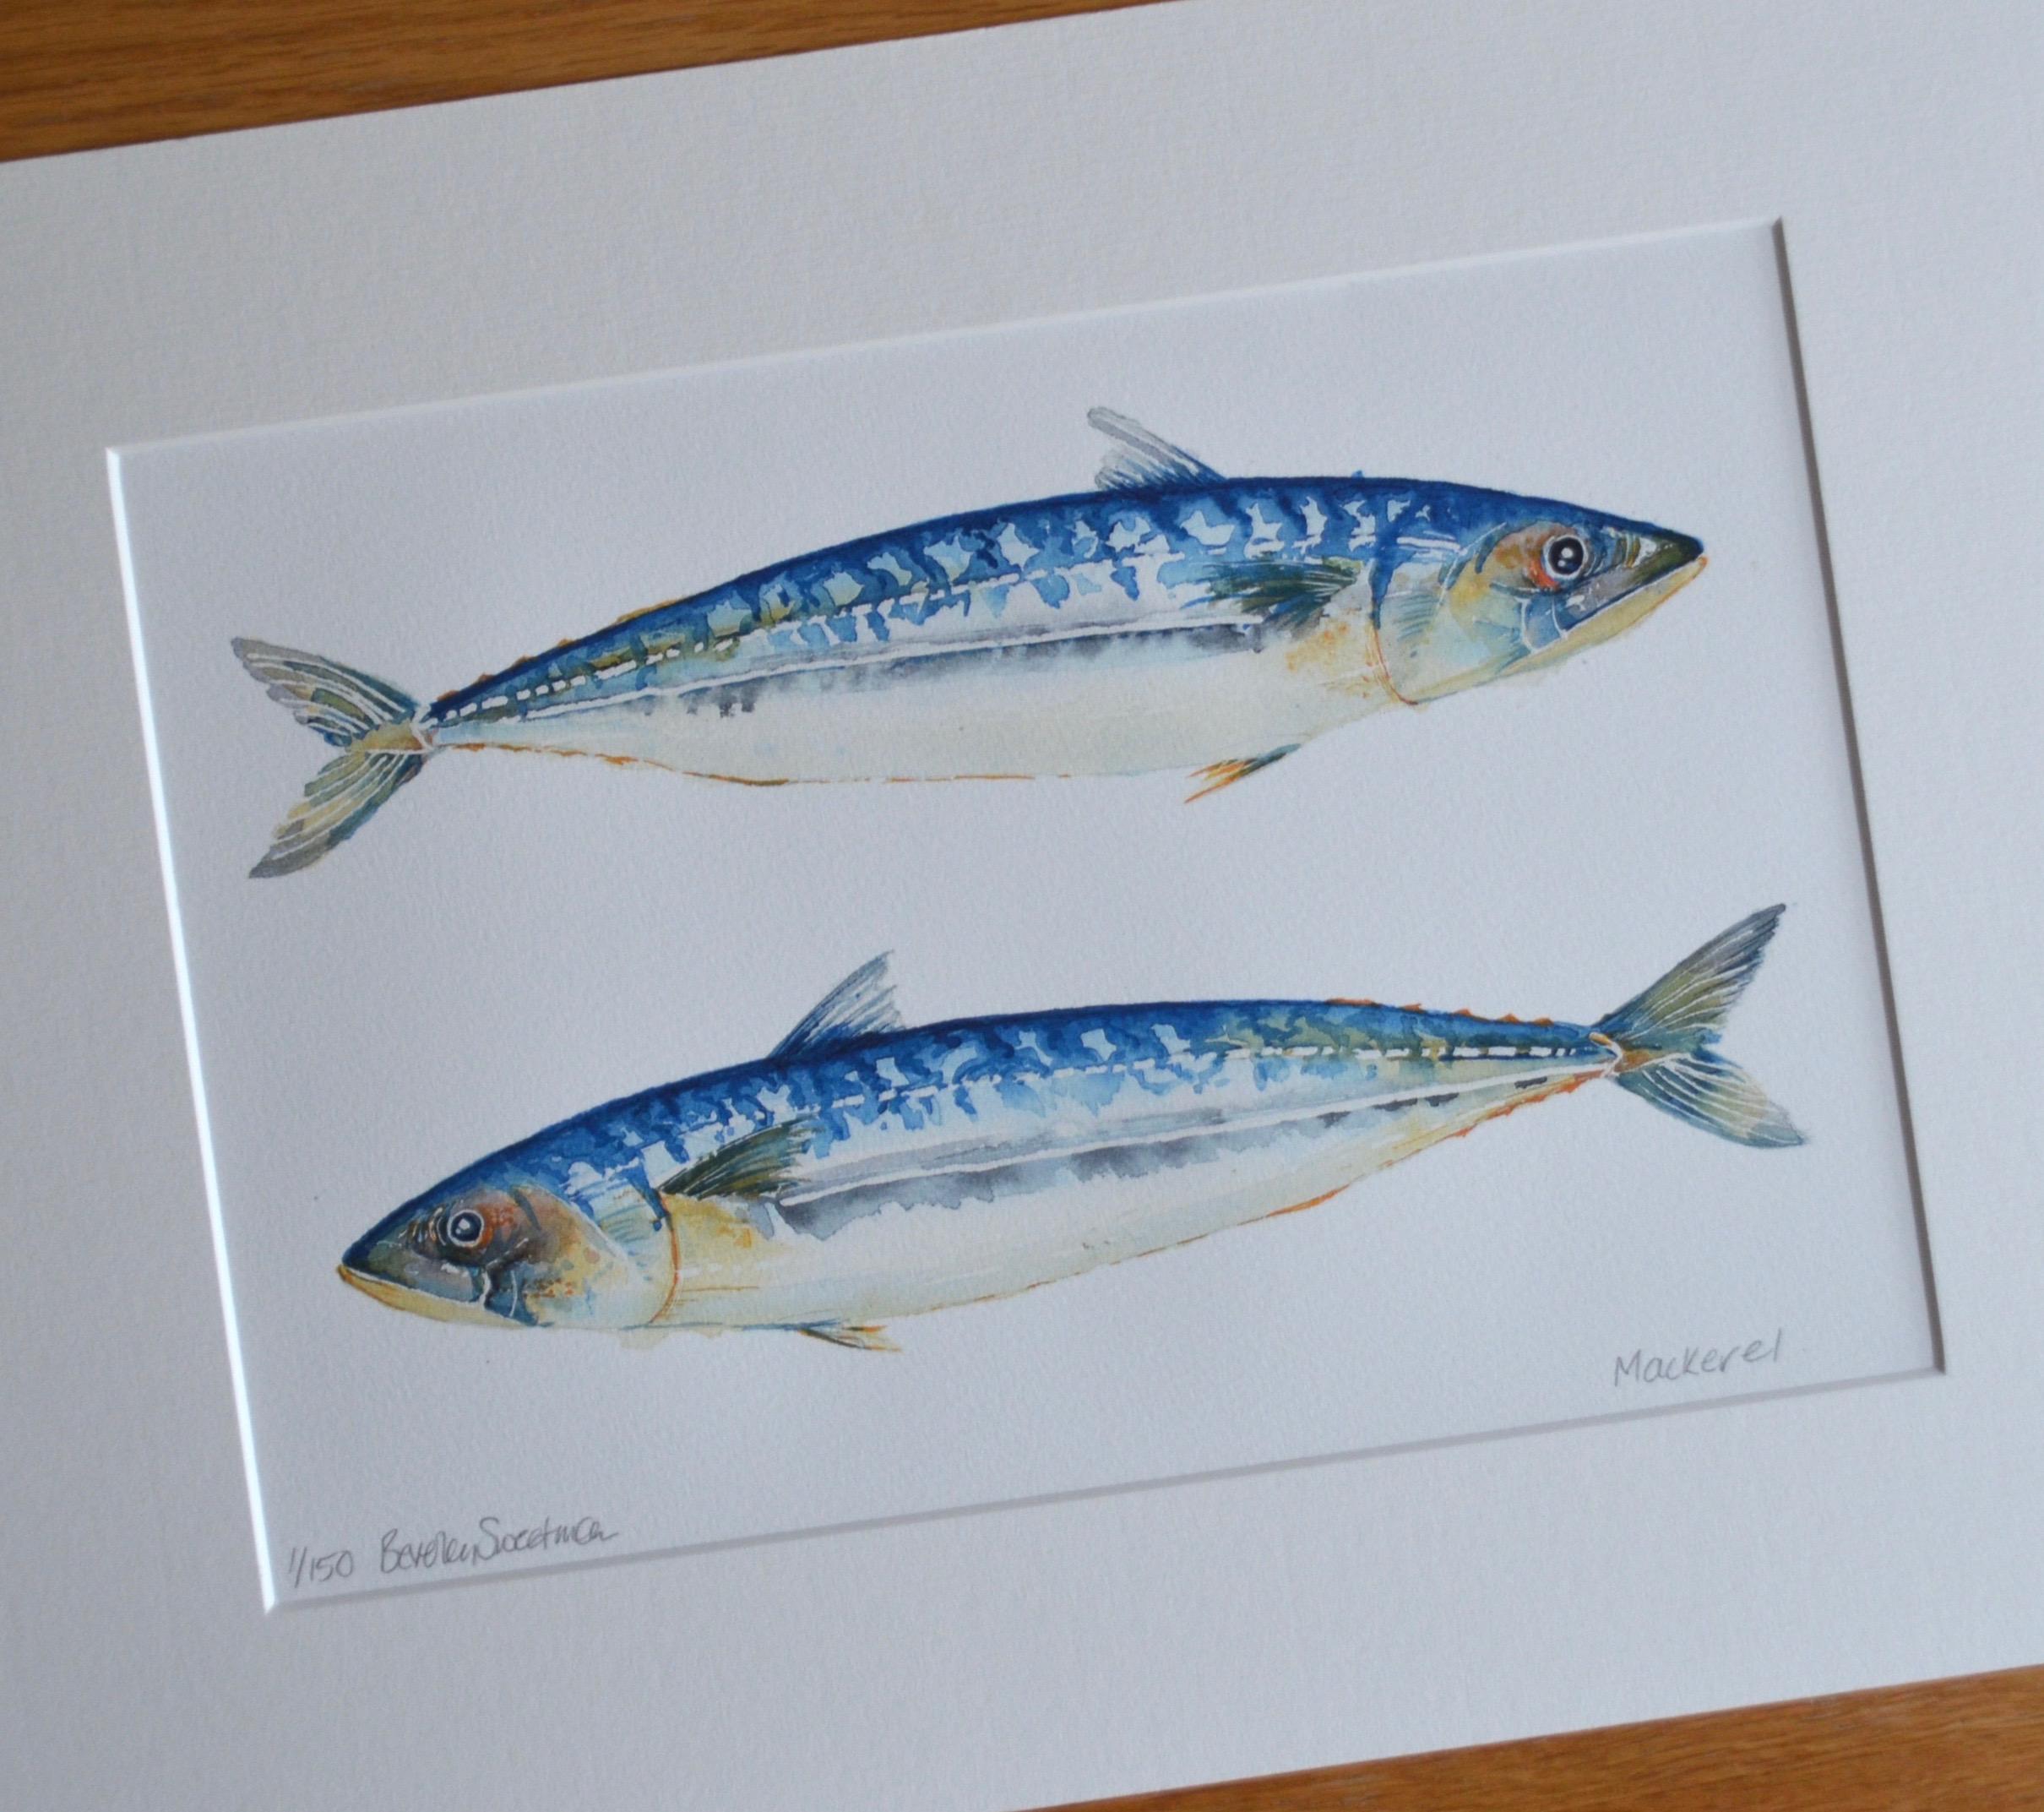 The Rusty Mackerel A4 Print